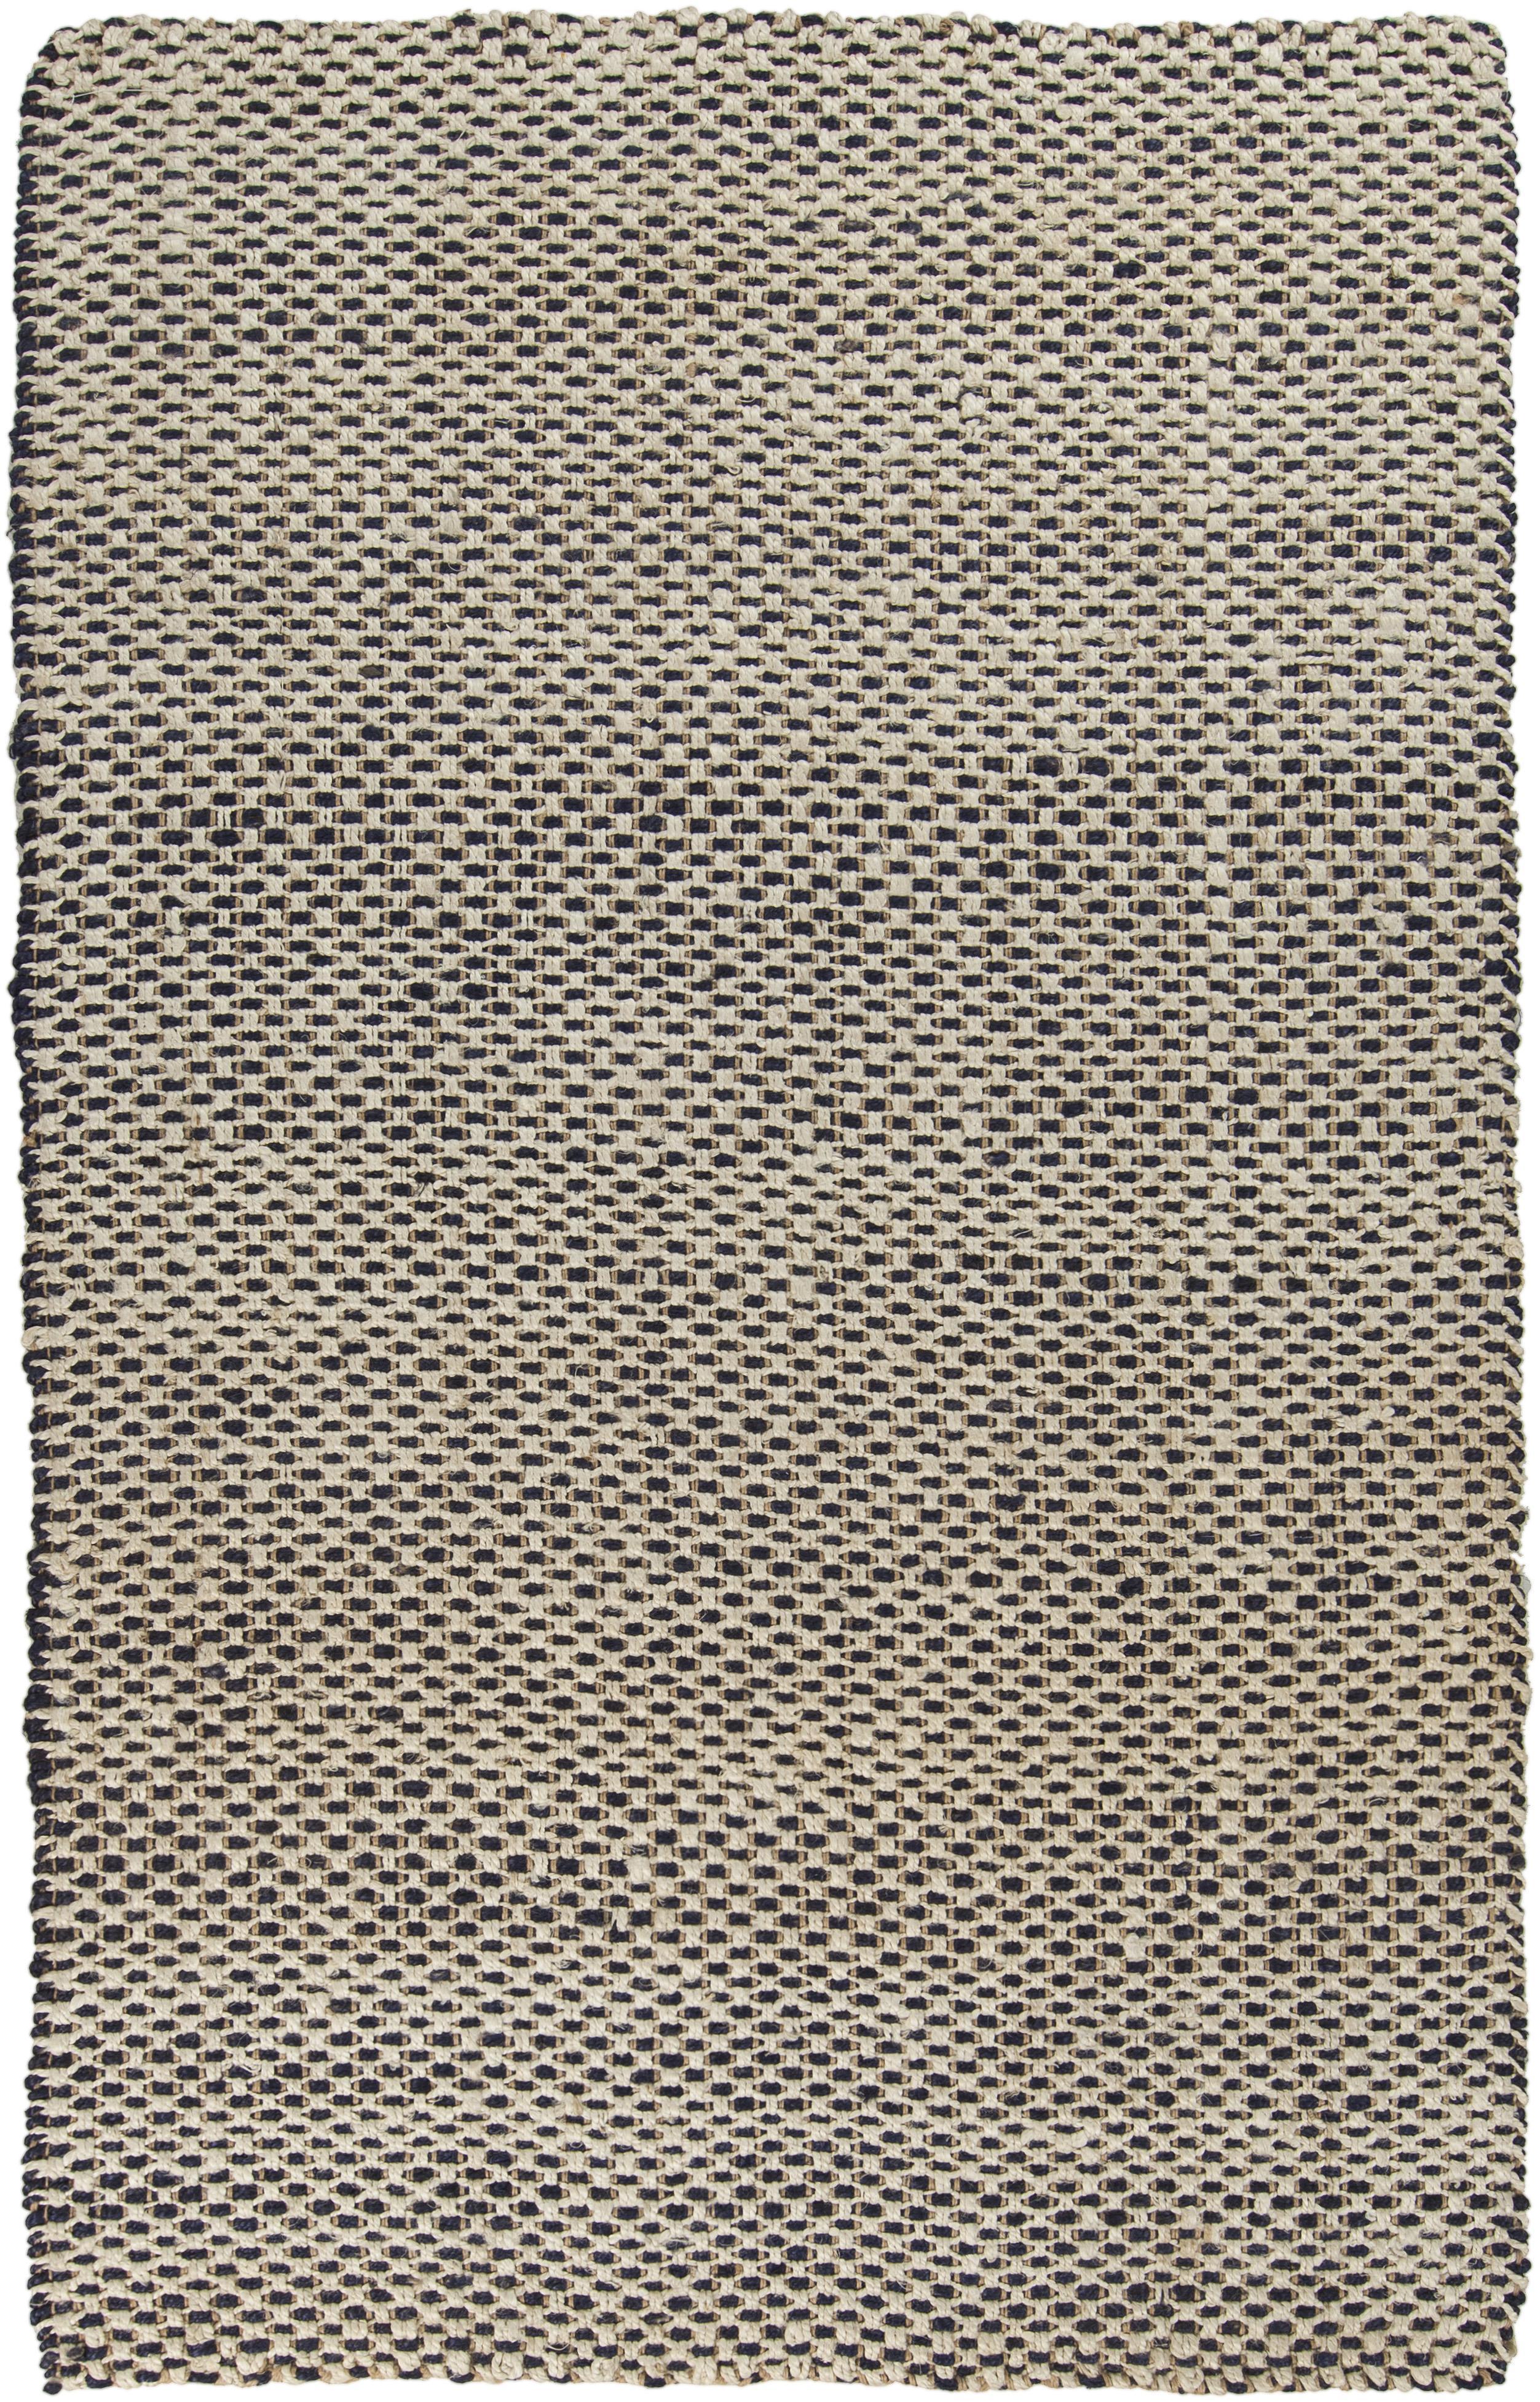 Surya Reeds 8' x 11' - Item Number: REED825-811